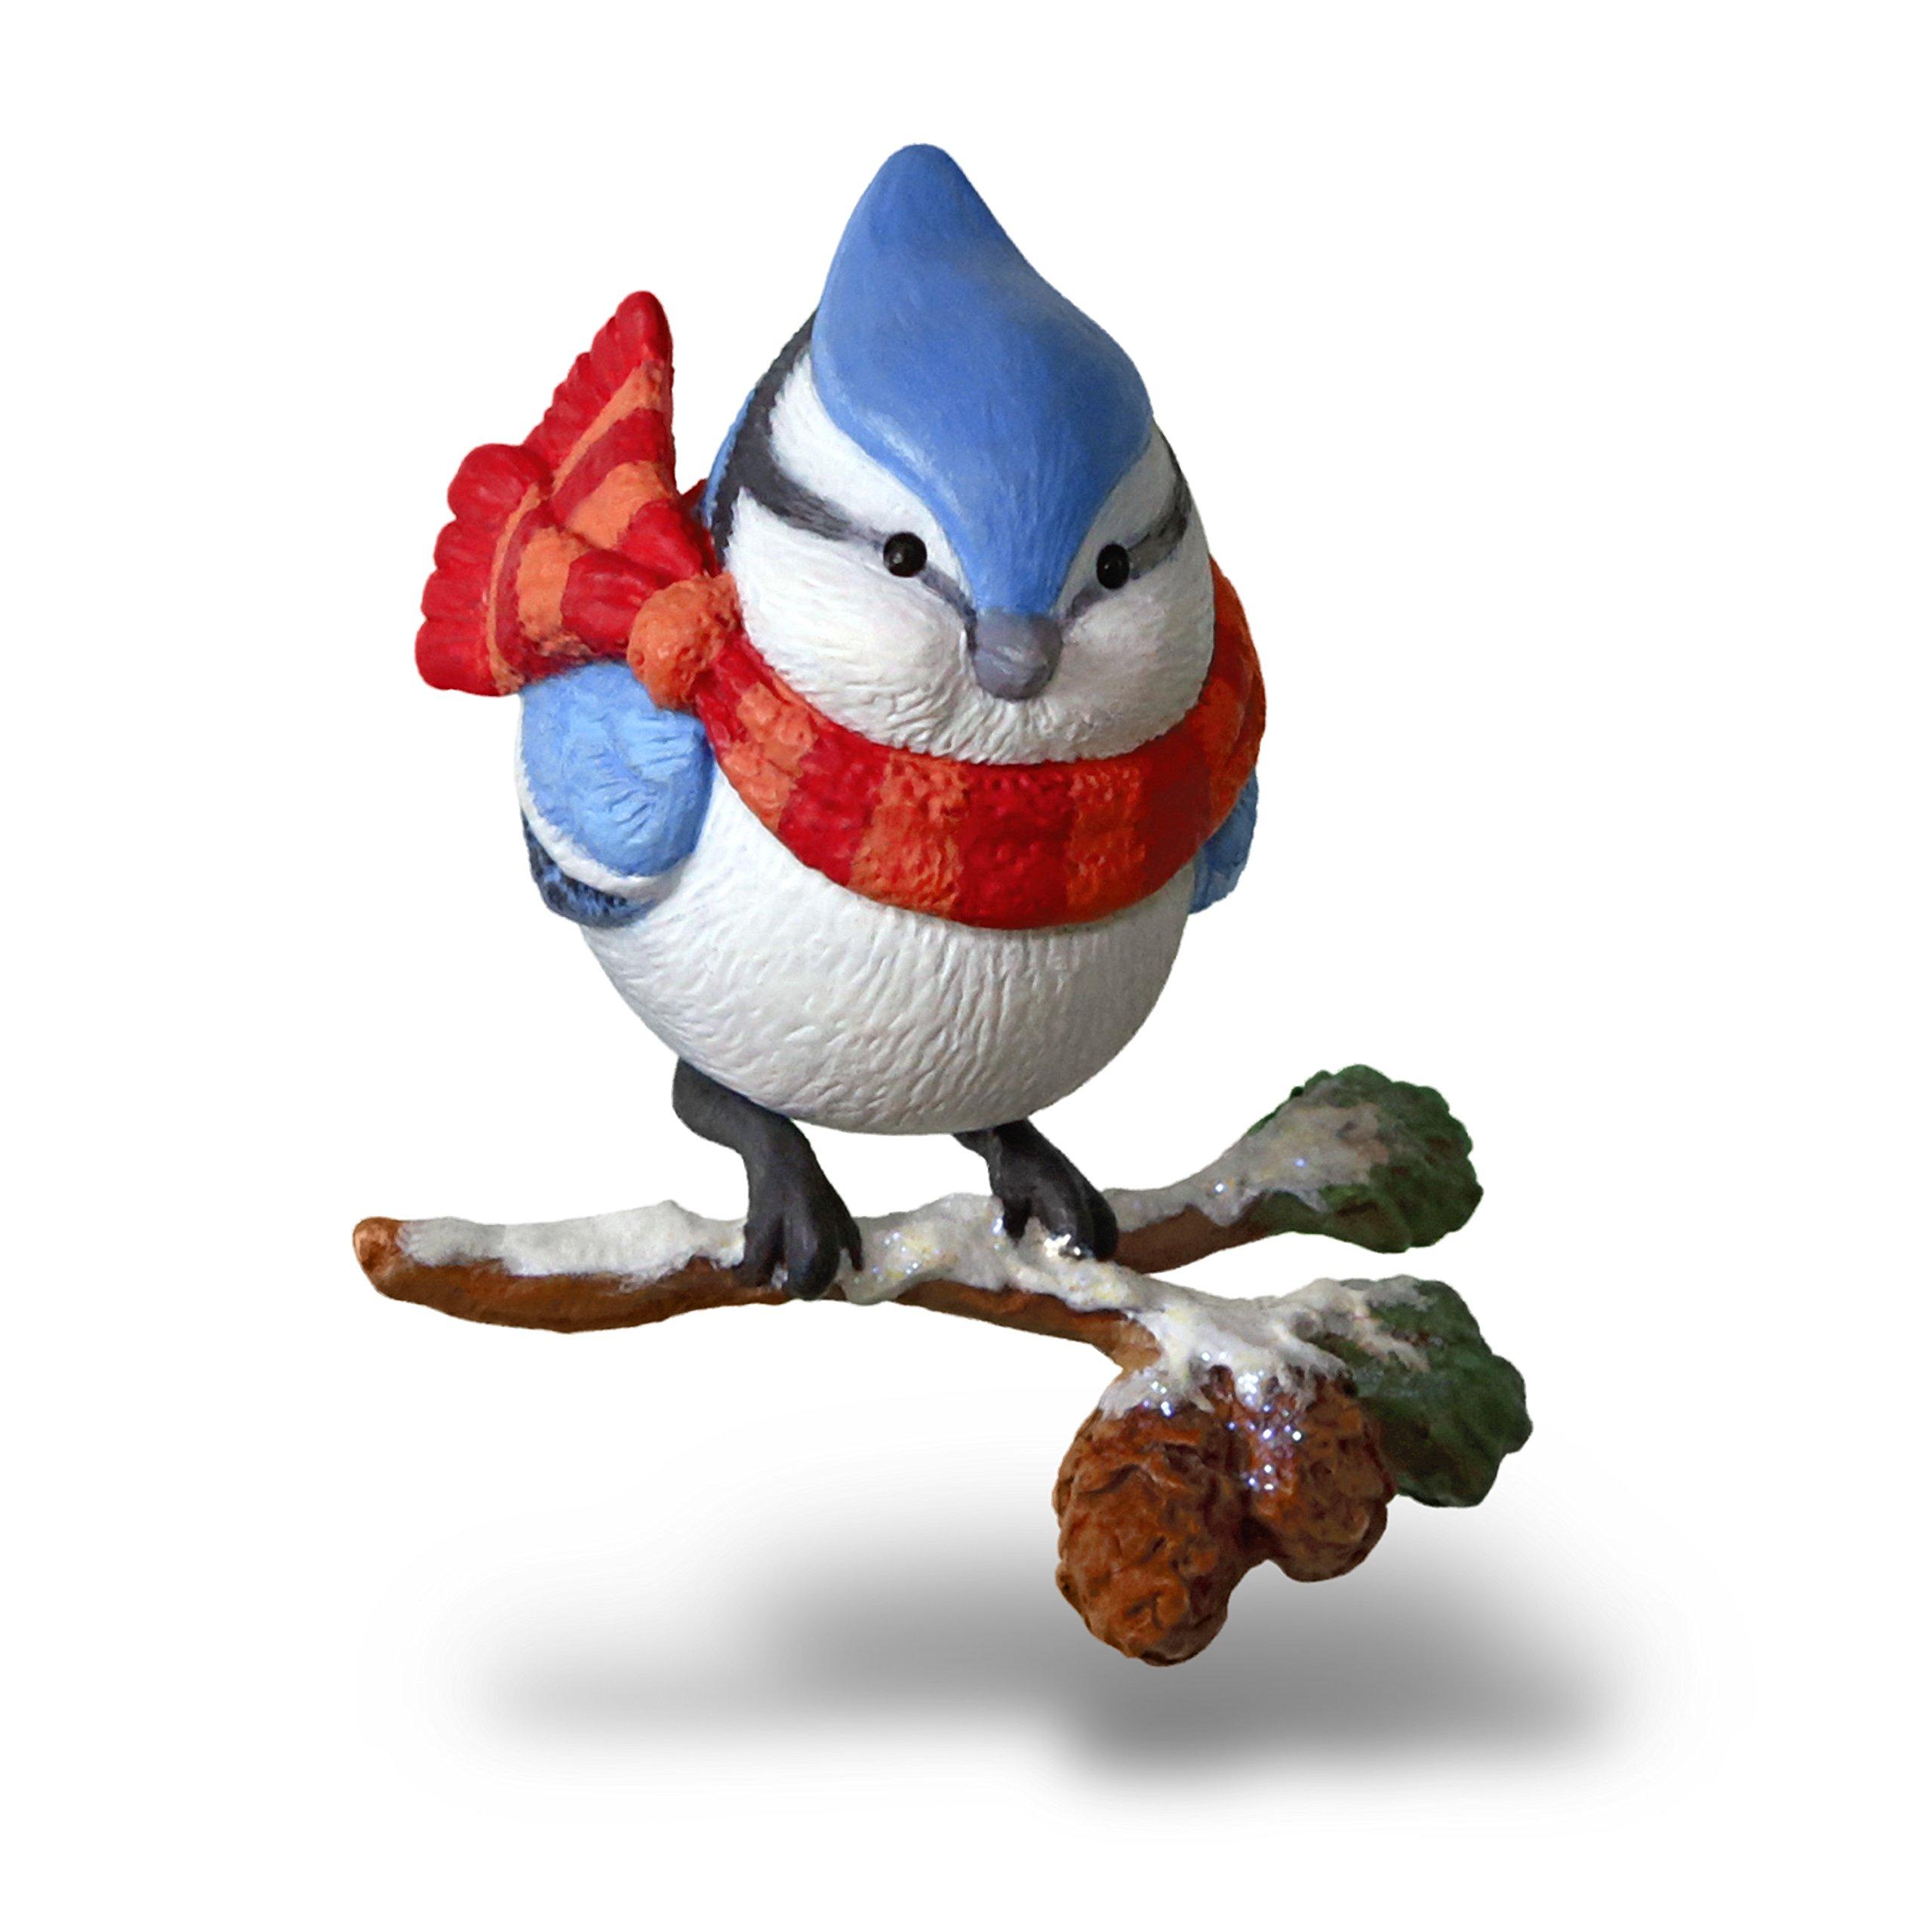 Hallmark Keepsake Christmas Ornament 2018 Year Dated, Cozy Critters Blue Jay